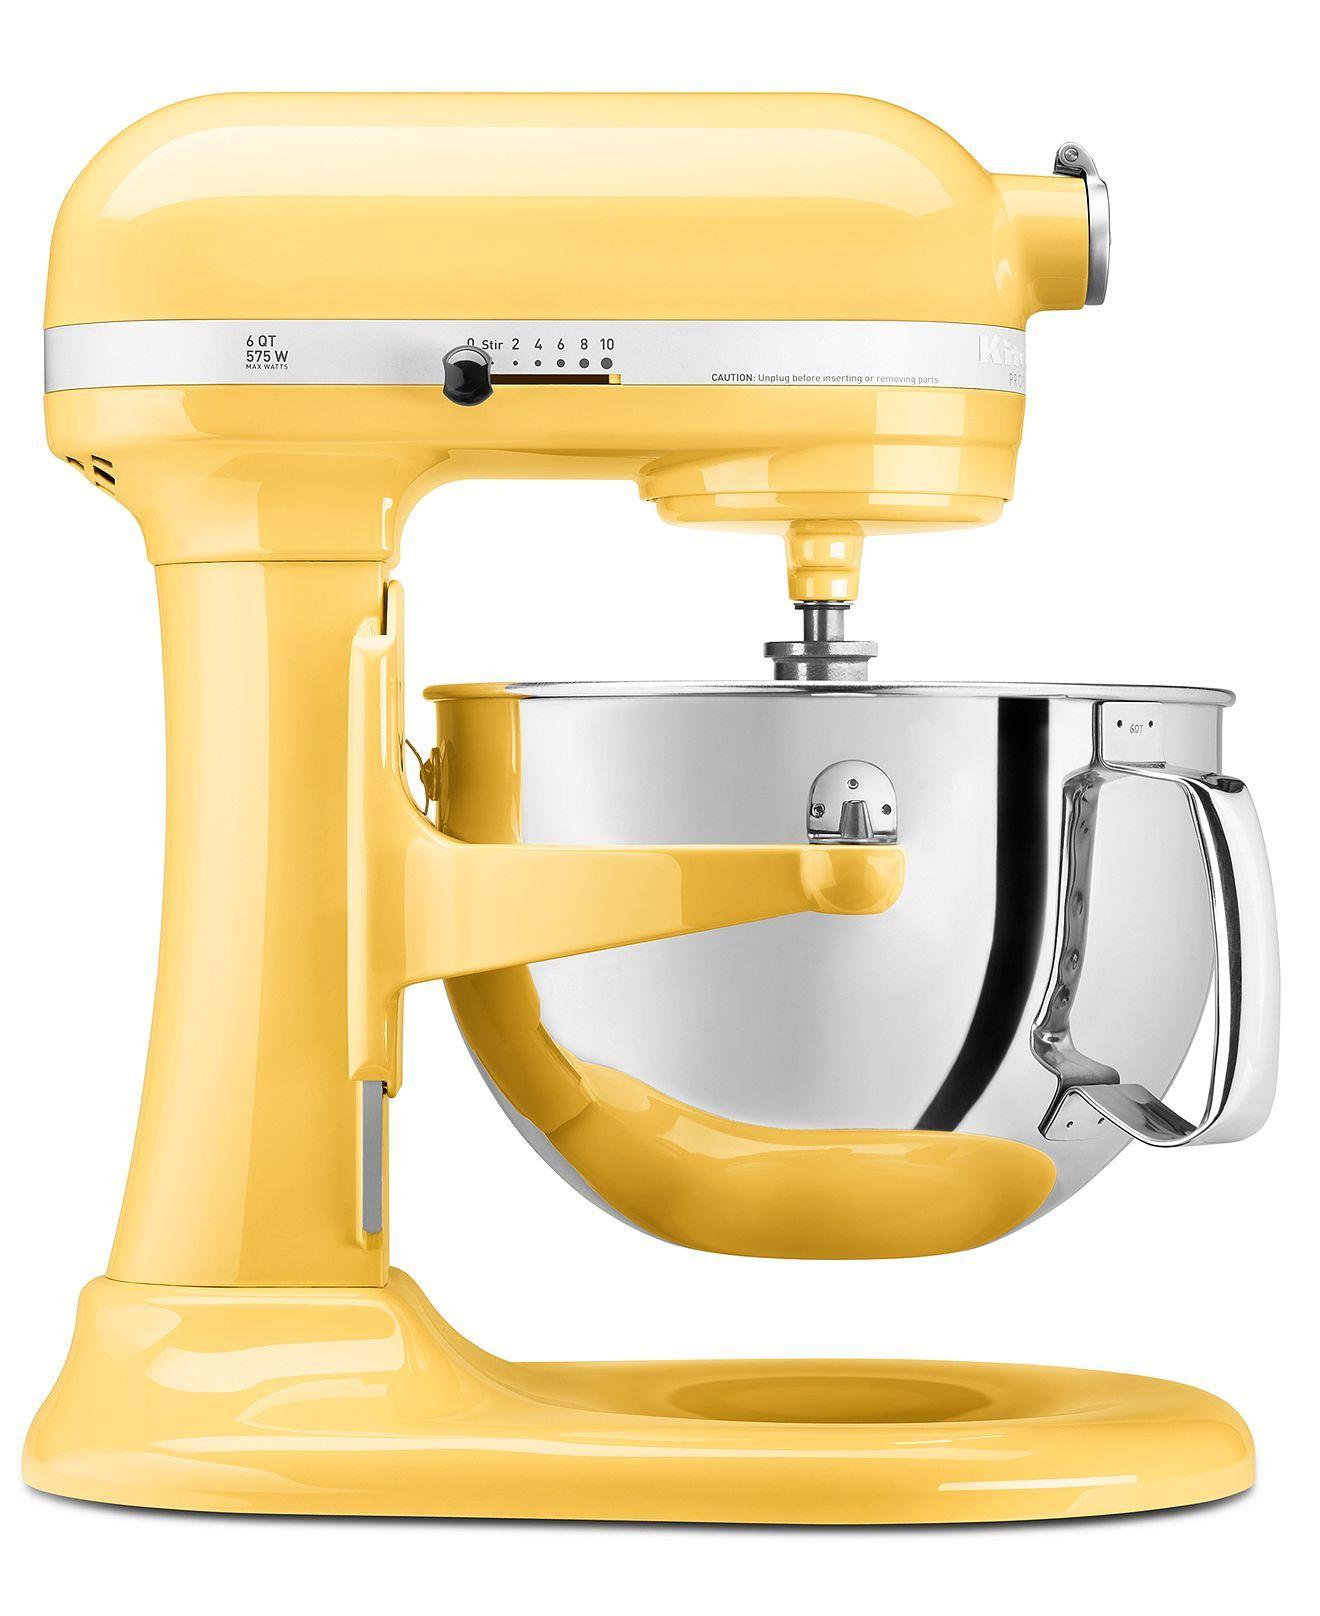 International home housewares show 2013 kitchenaid custom - Kitchenaid Kp26m1x Professional 600 6 Qt Stand Mixer